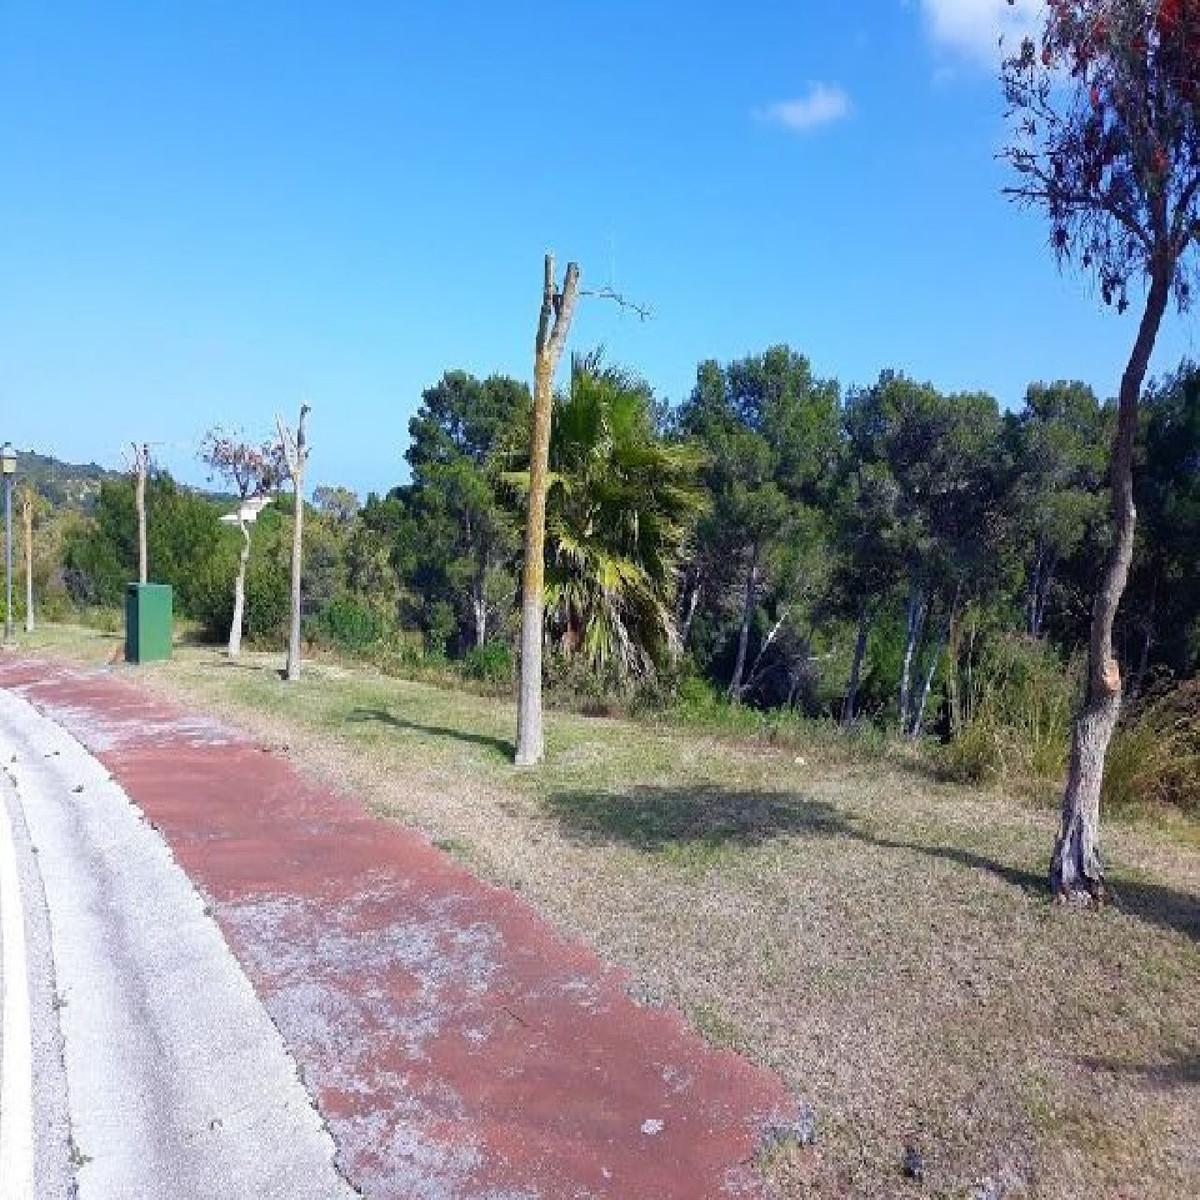 Residential Plot, Sotogrande, Costa del Sol. Garden/Plot 2475 m². THE RESERVE OF SOTOGRANDE. reduced,Spain